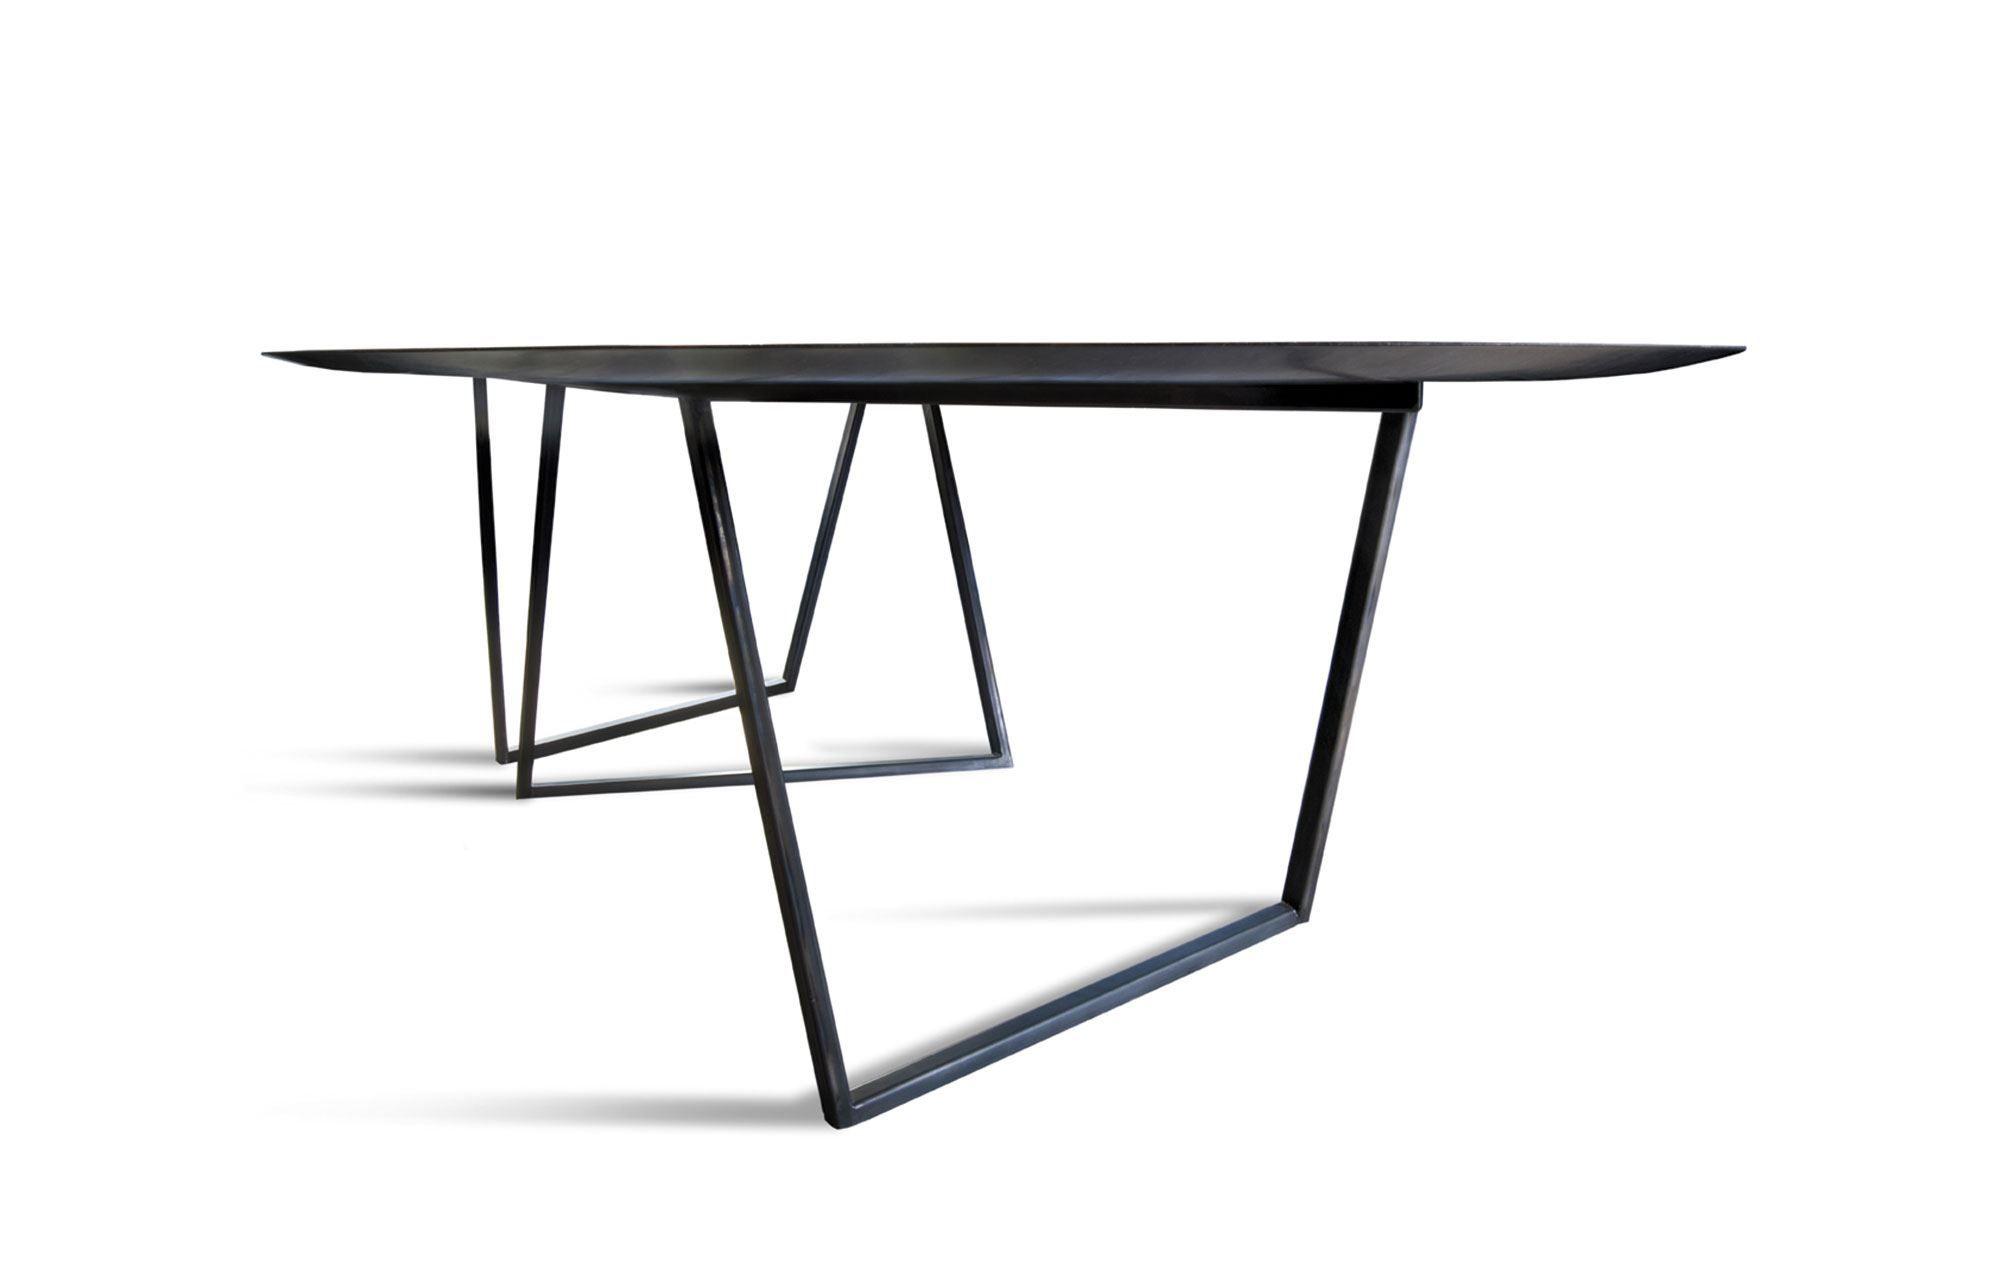 0d4f43e7a7cc2d189f9ff92c288121d6 Top Result 50 Luxury Black and White Coffee Table Image 2017 Shdy7